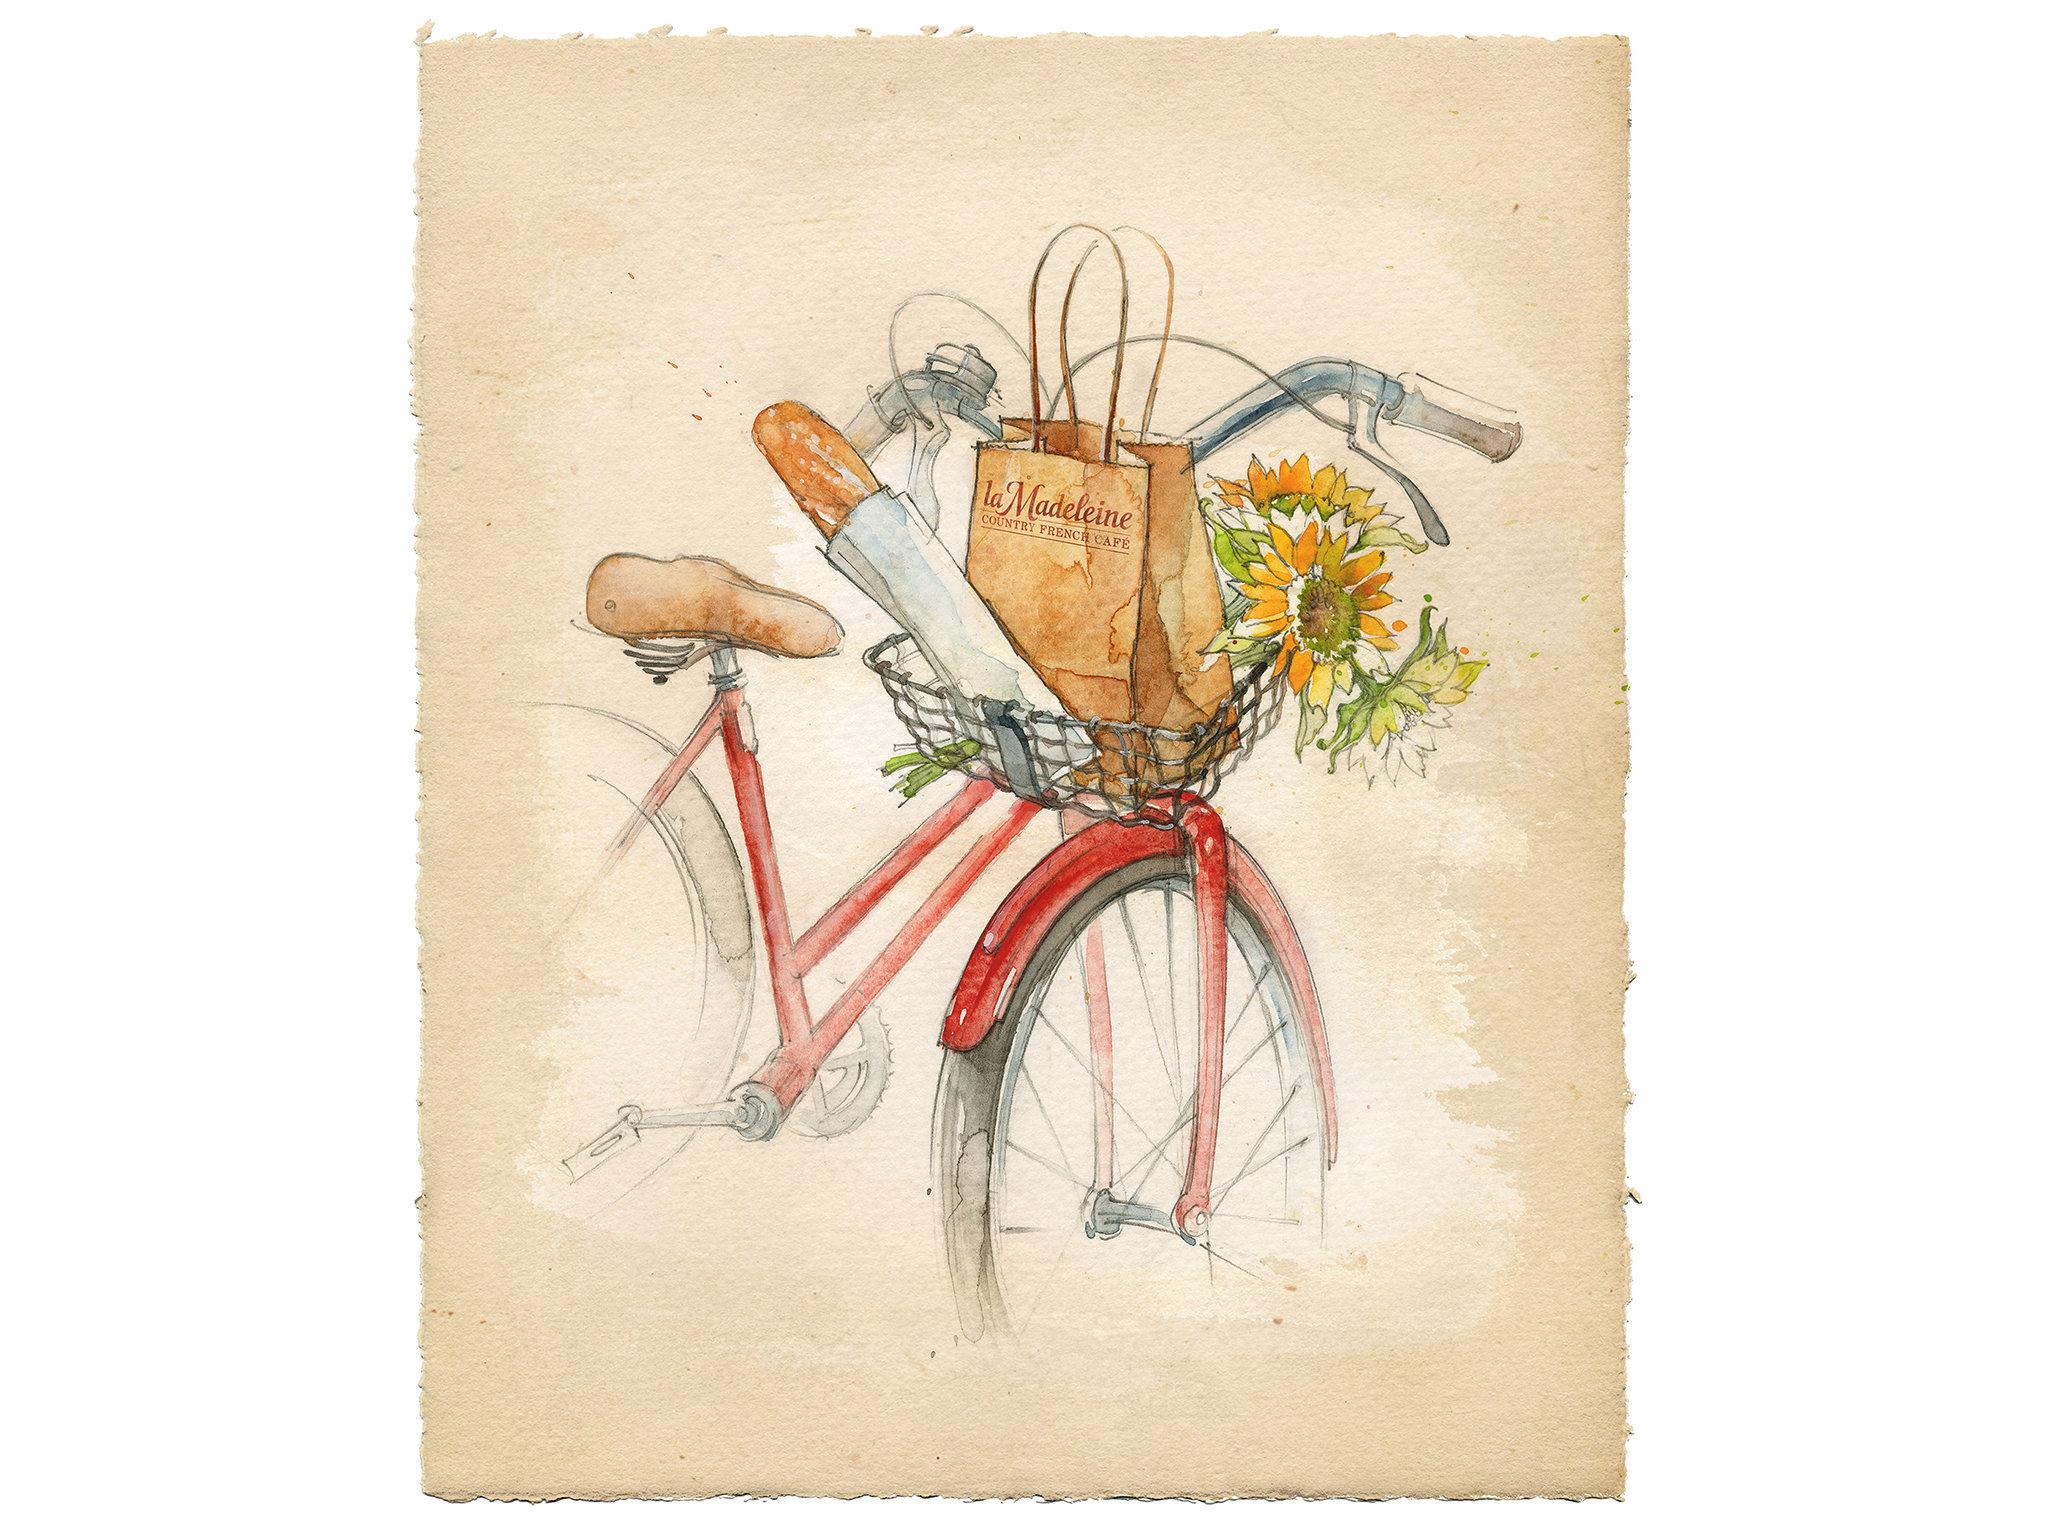 NARDA_Bikebasket_wb.narrative@72.jpg